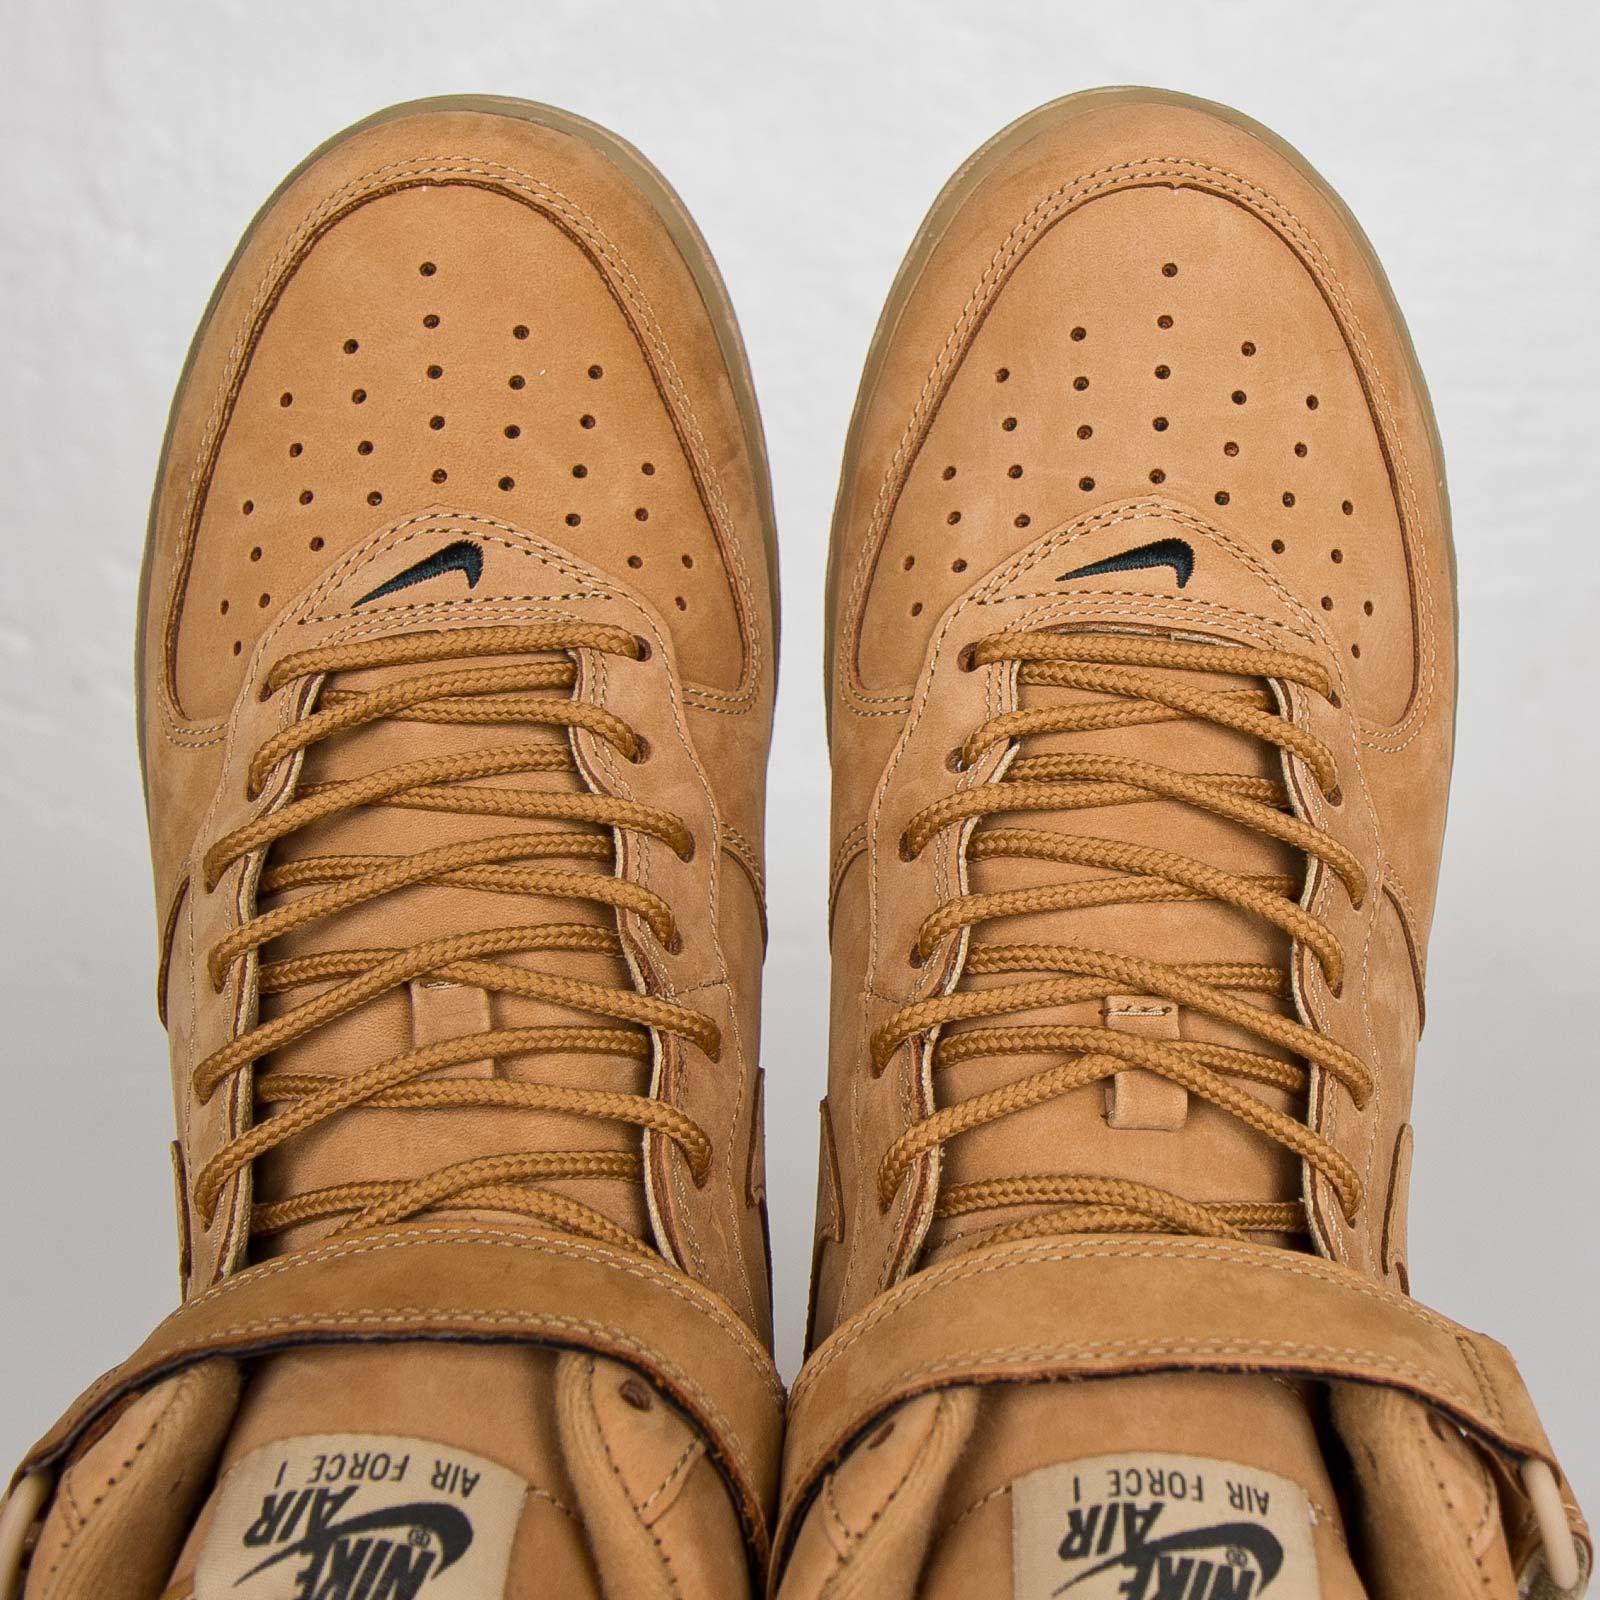 billig Nike Air Force 1 '07 PRM Orange Just Do It Collection